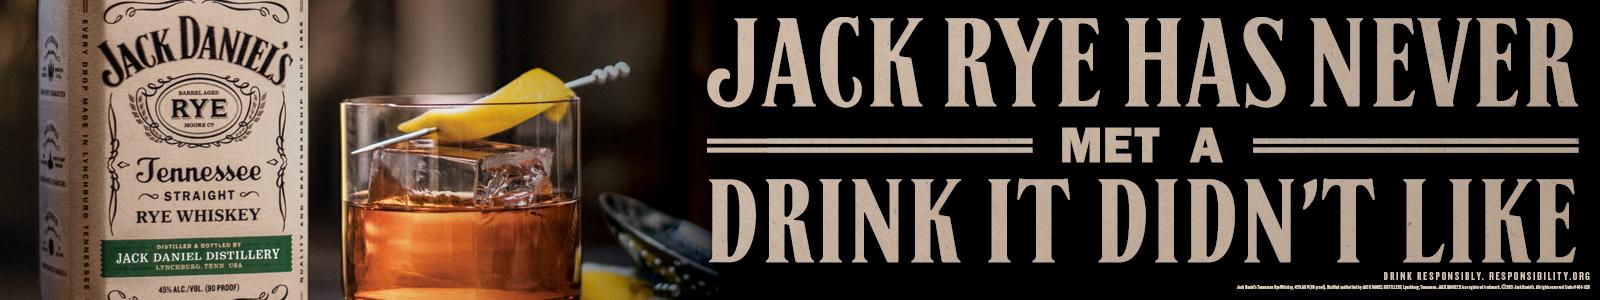 Jack Daniels/Brown Forman